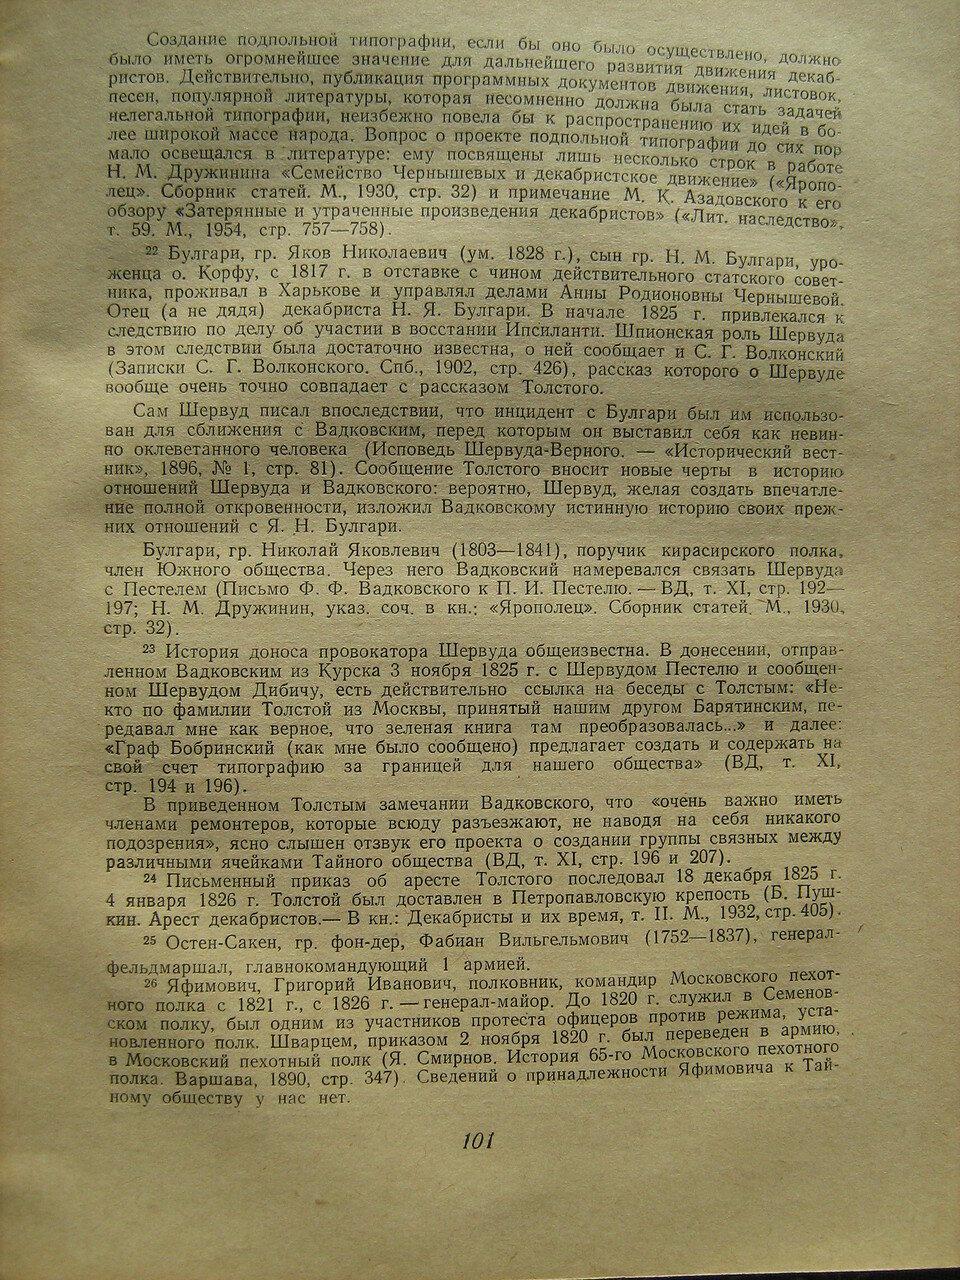 https://img-fotki.yandex.ru/get/931298/199368979.df/0_21f751_2e871a16_XXXL.jpg